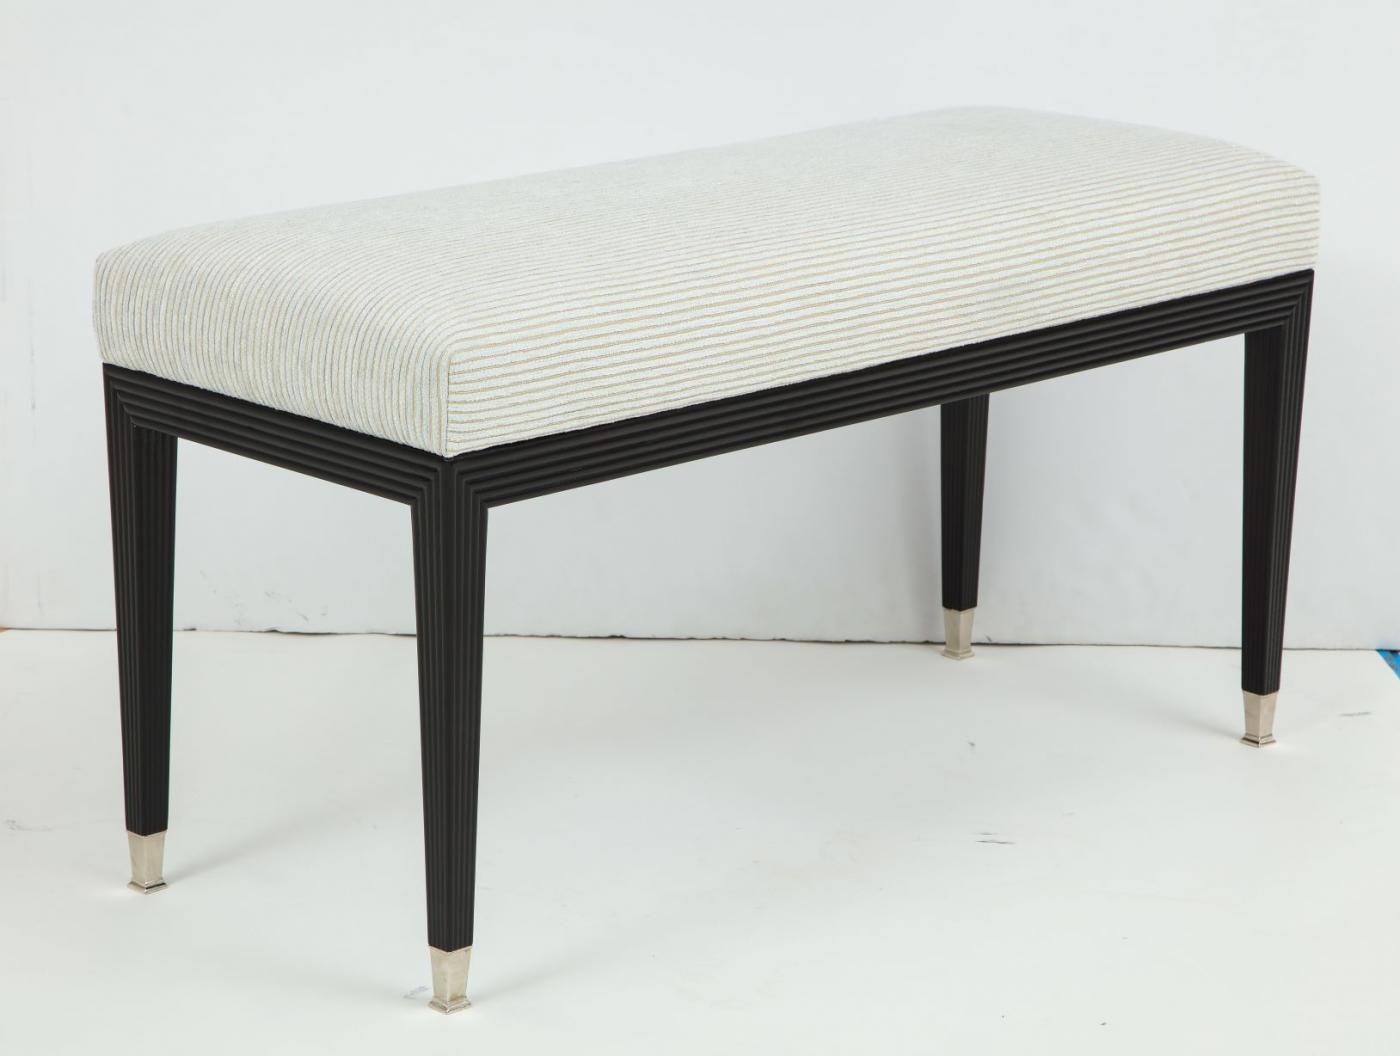 Modernist Bench of Contemporary Design